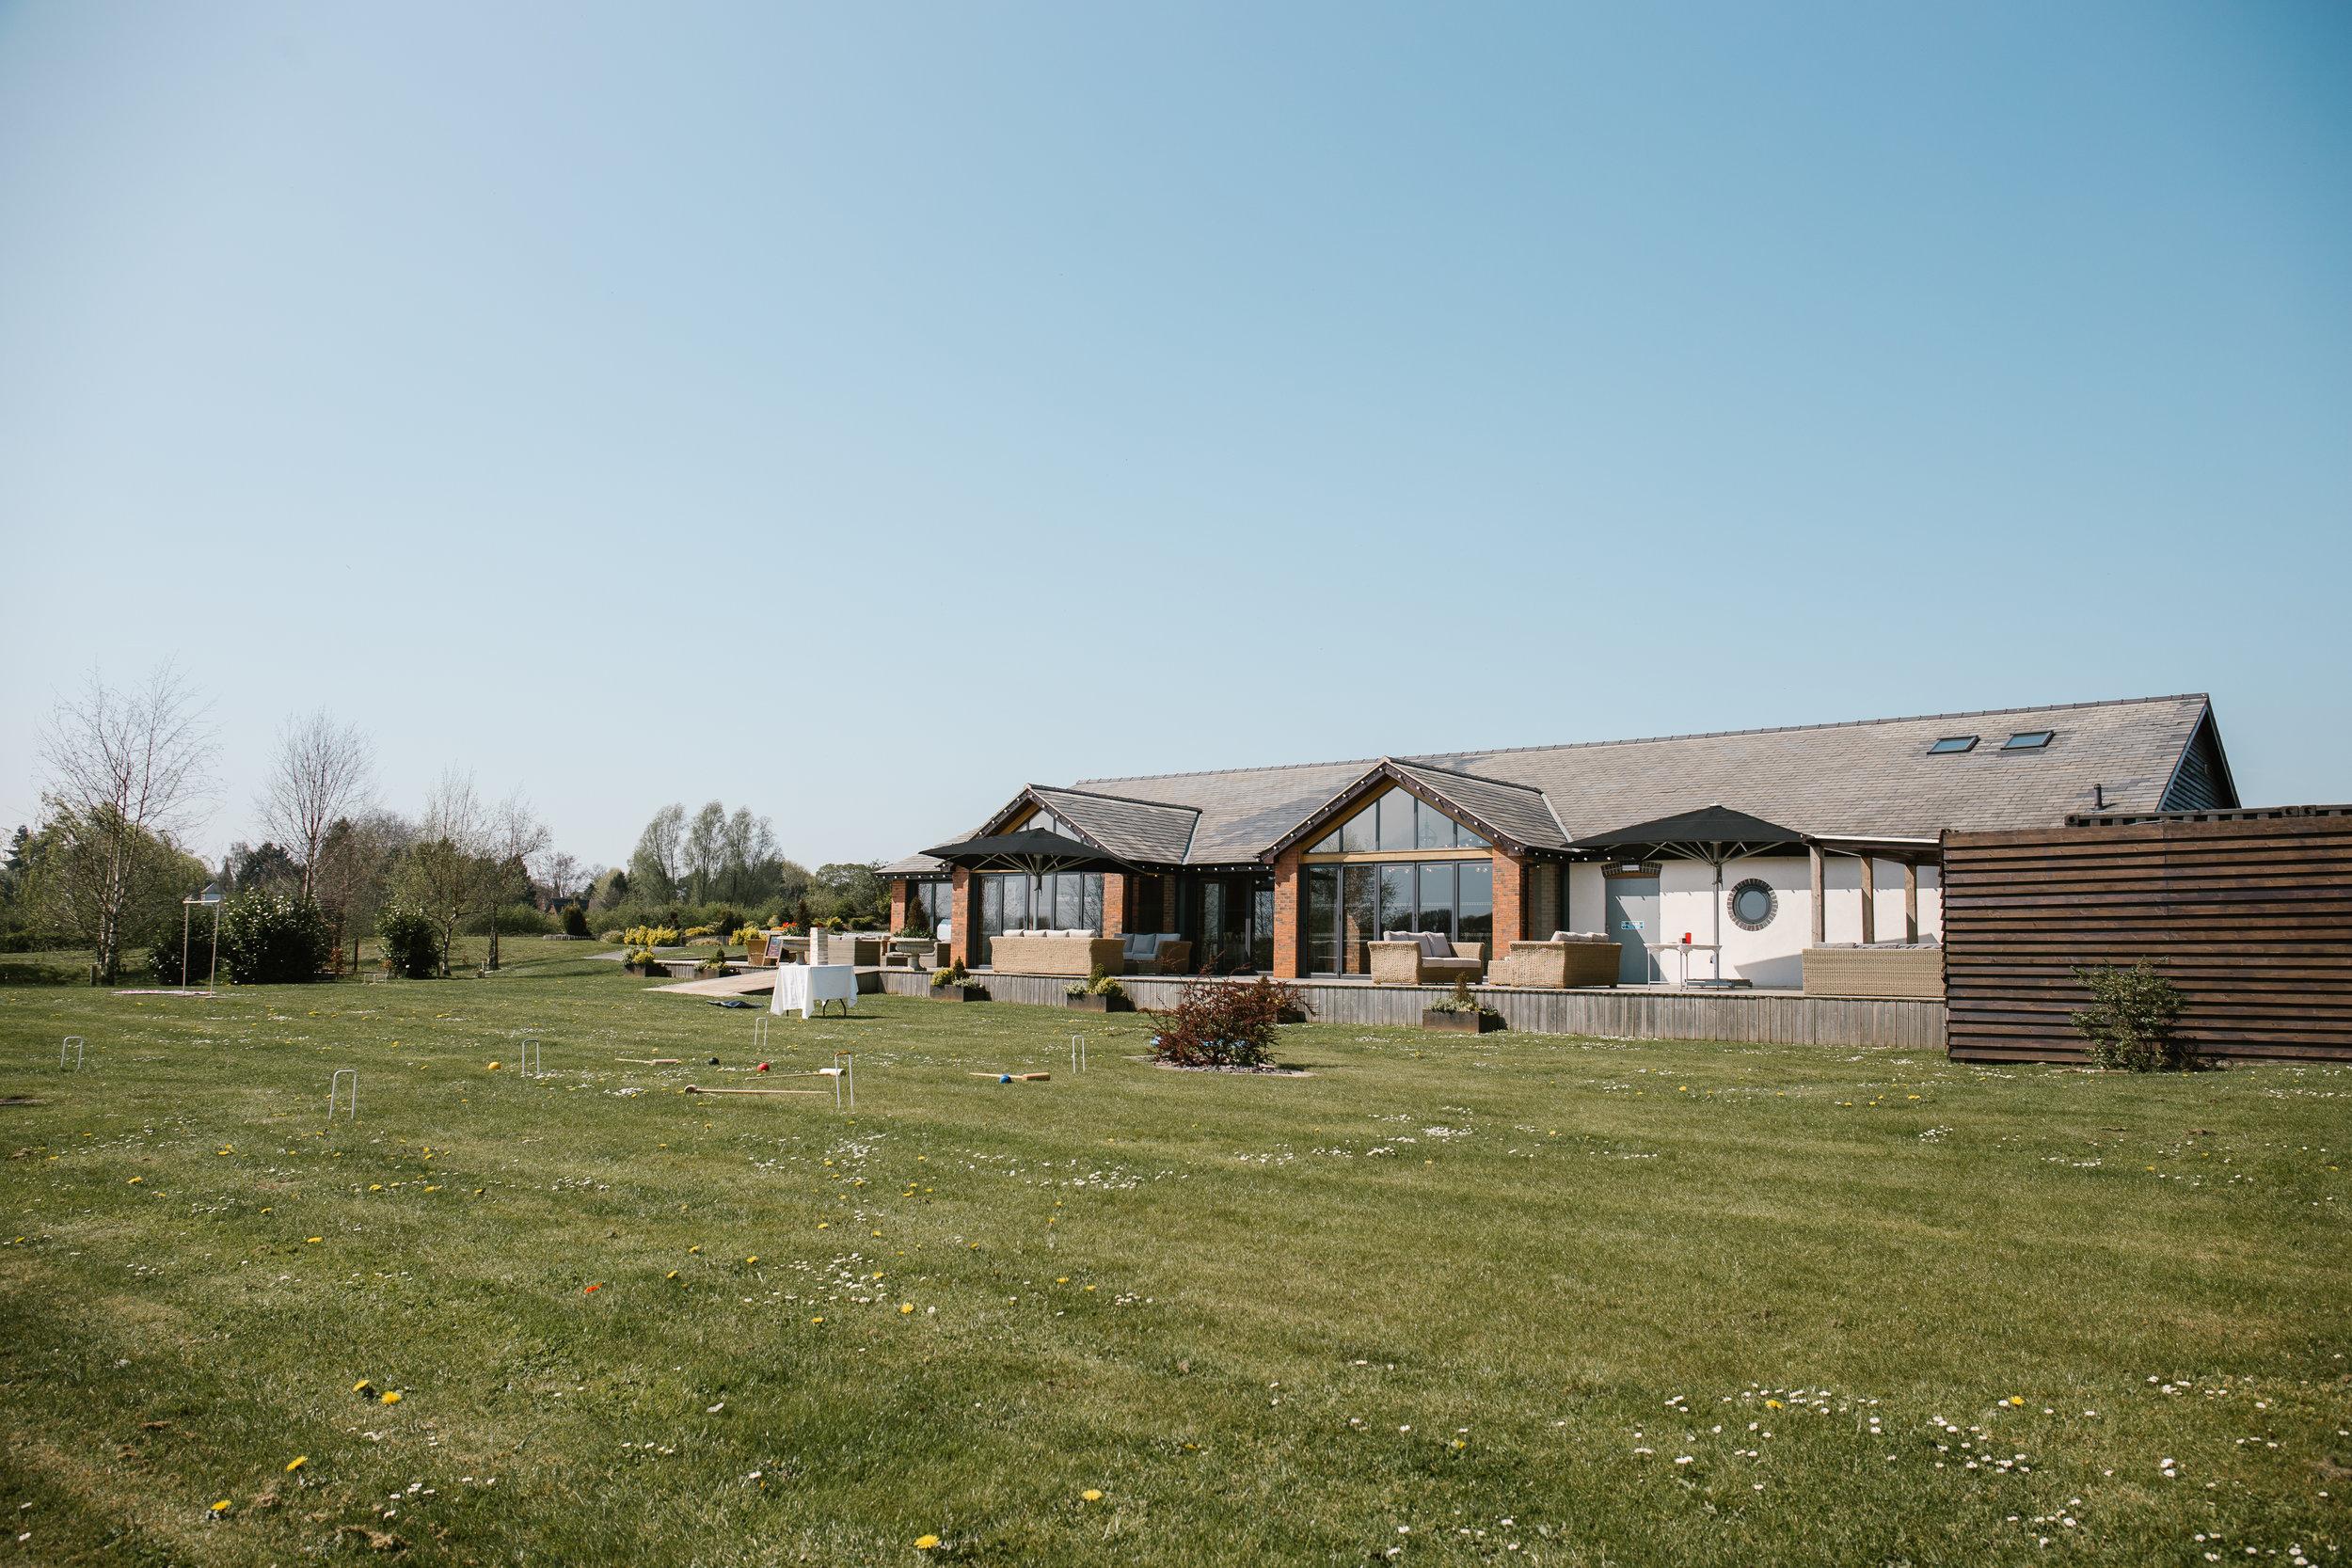 The boat house at Aston marina wedding venue